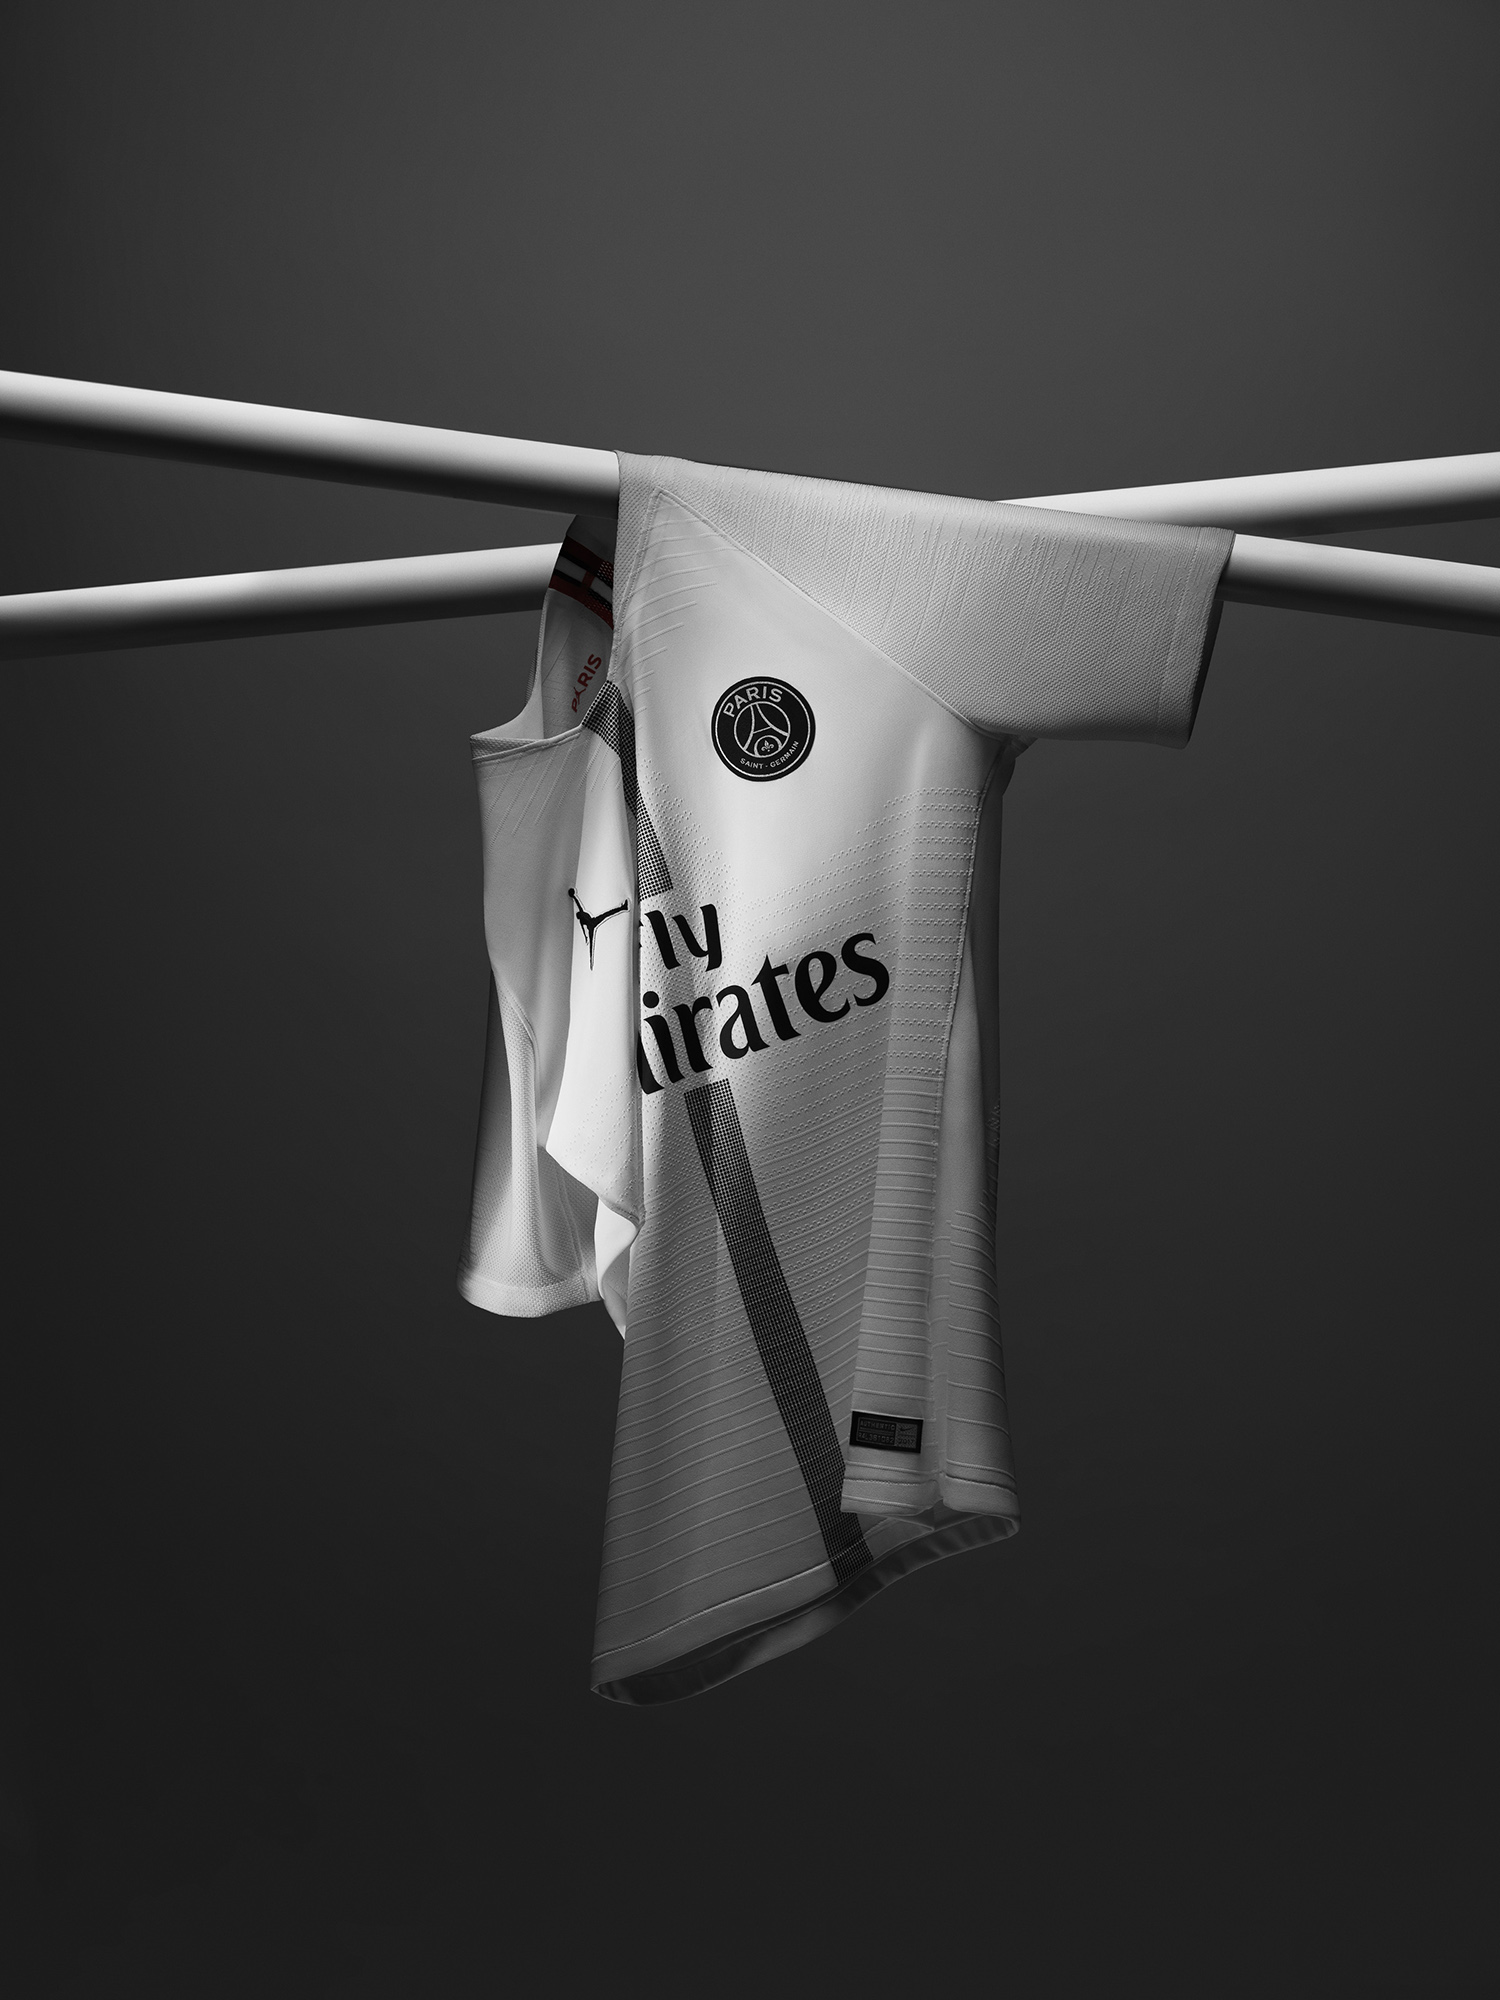 Jordan-Brand-x-Paris-Saint-Germain-1.jpg